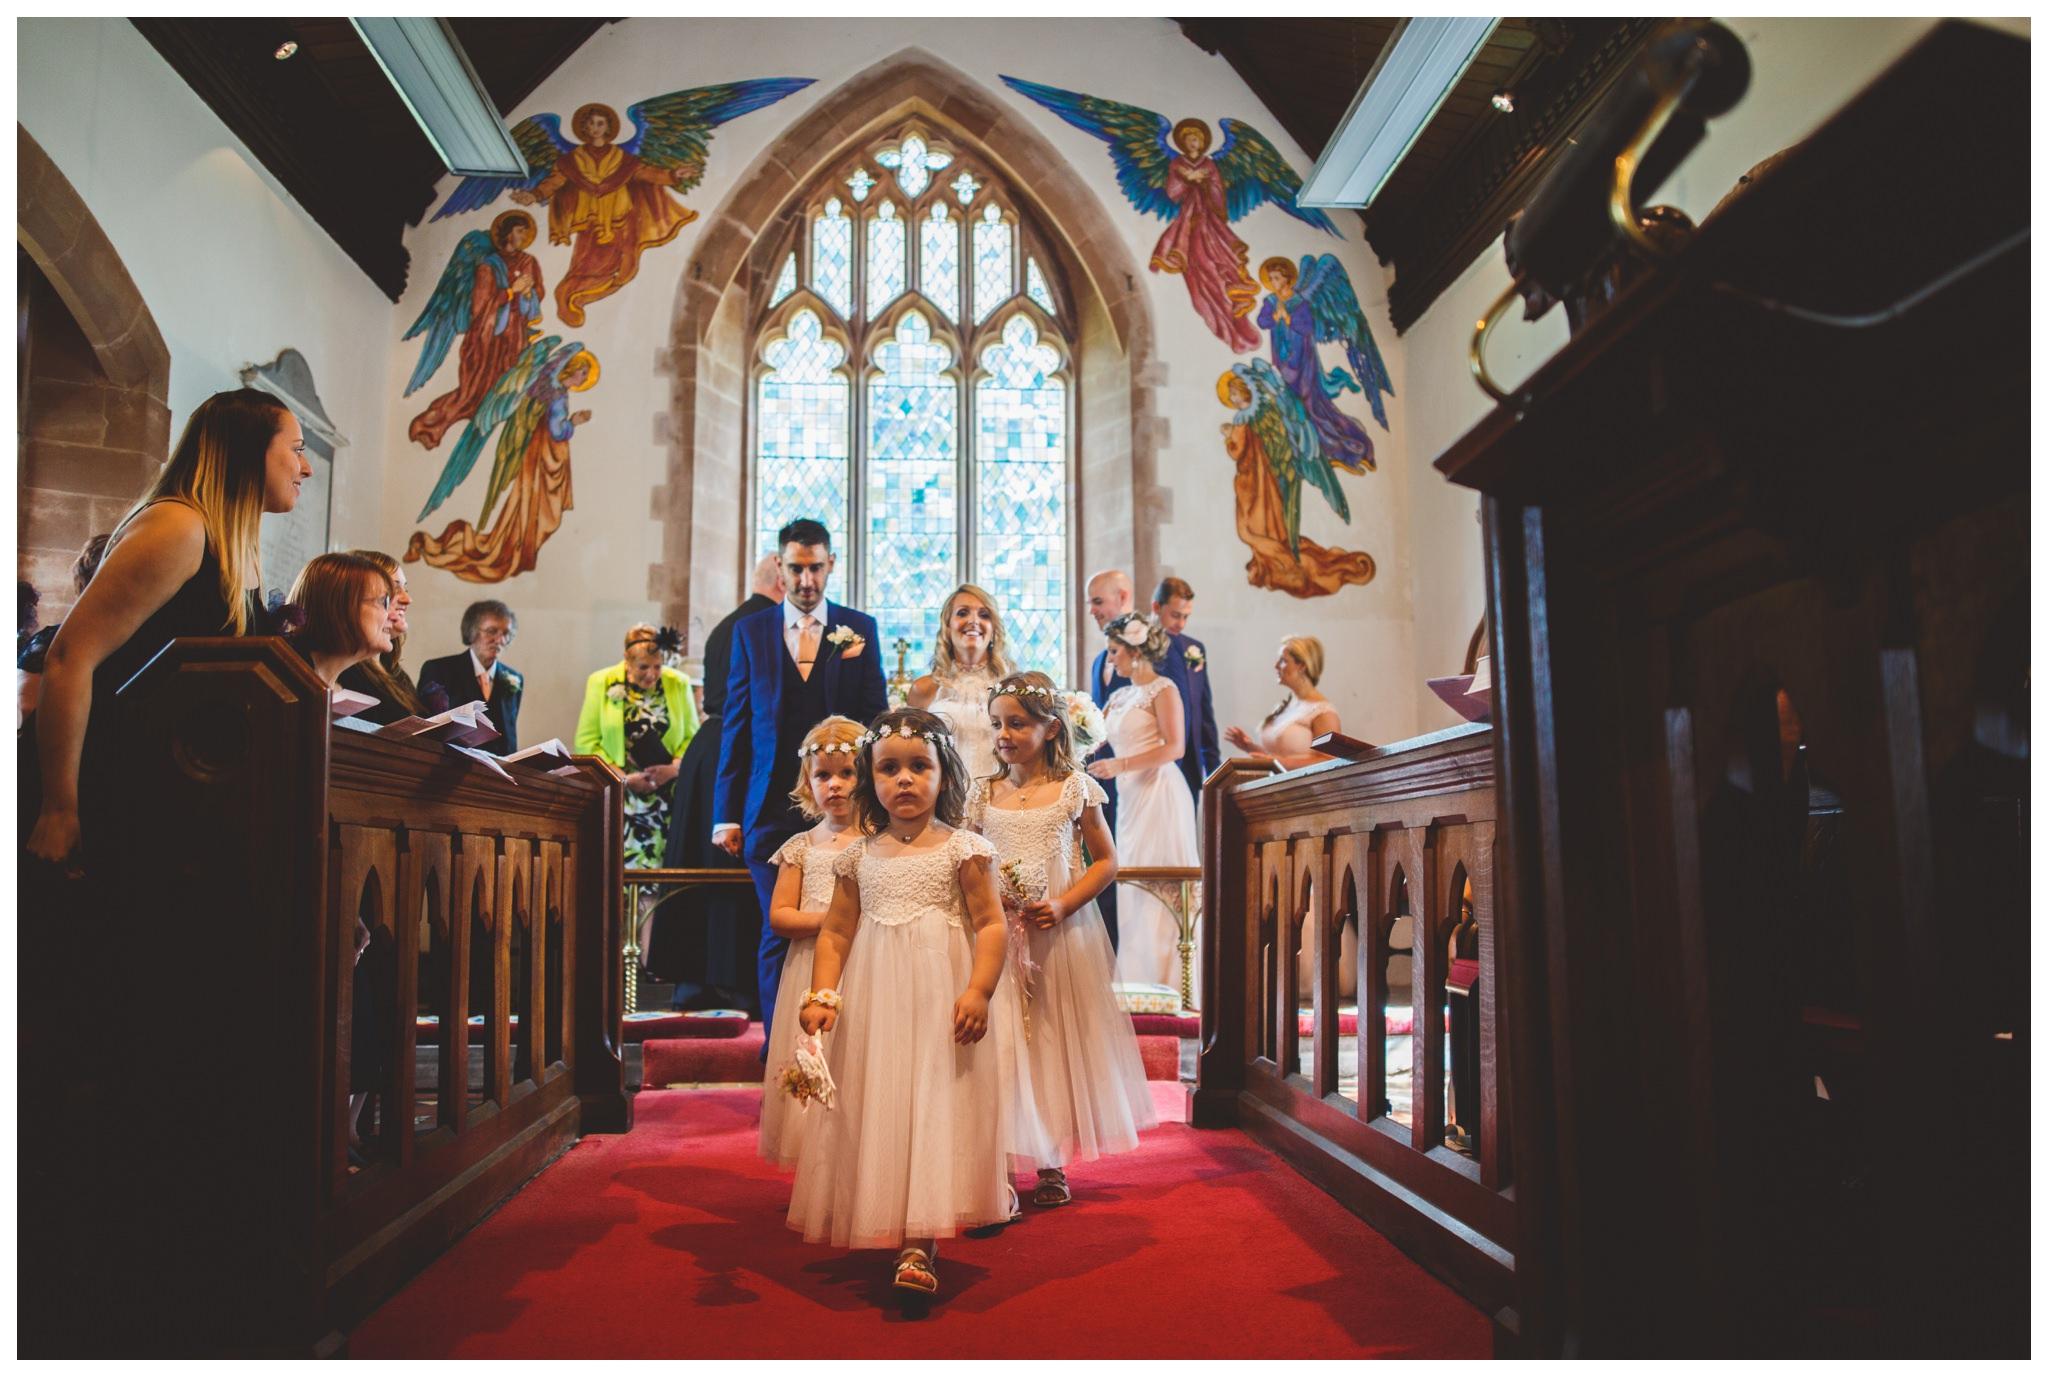 Richard Savage Photography - Wedding - Peterstone Court Brecon - 2016-05-11_0028